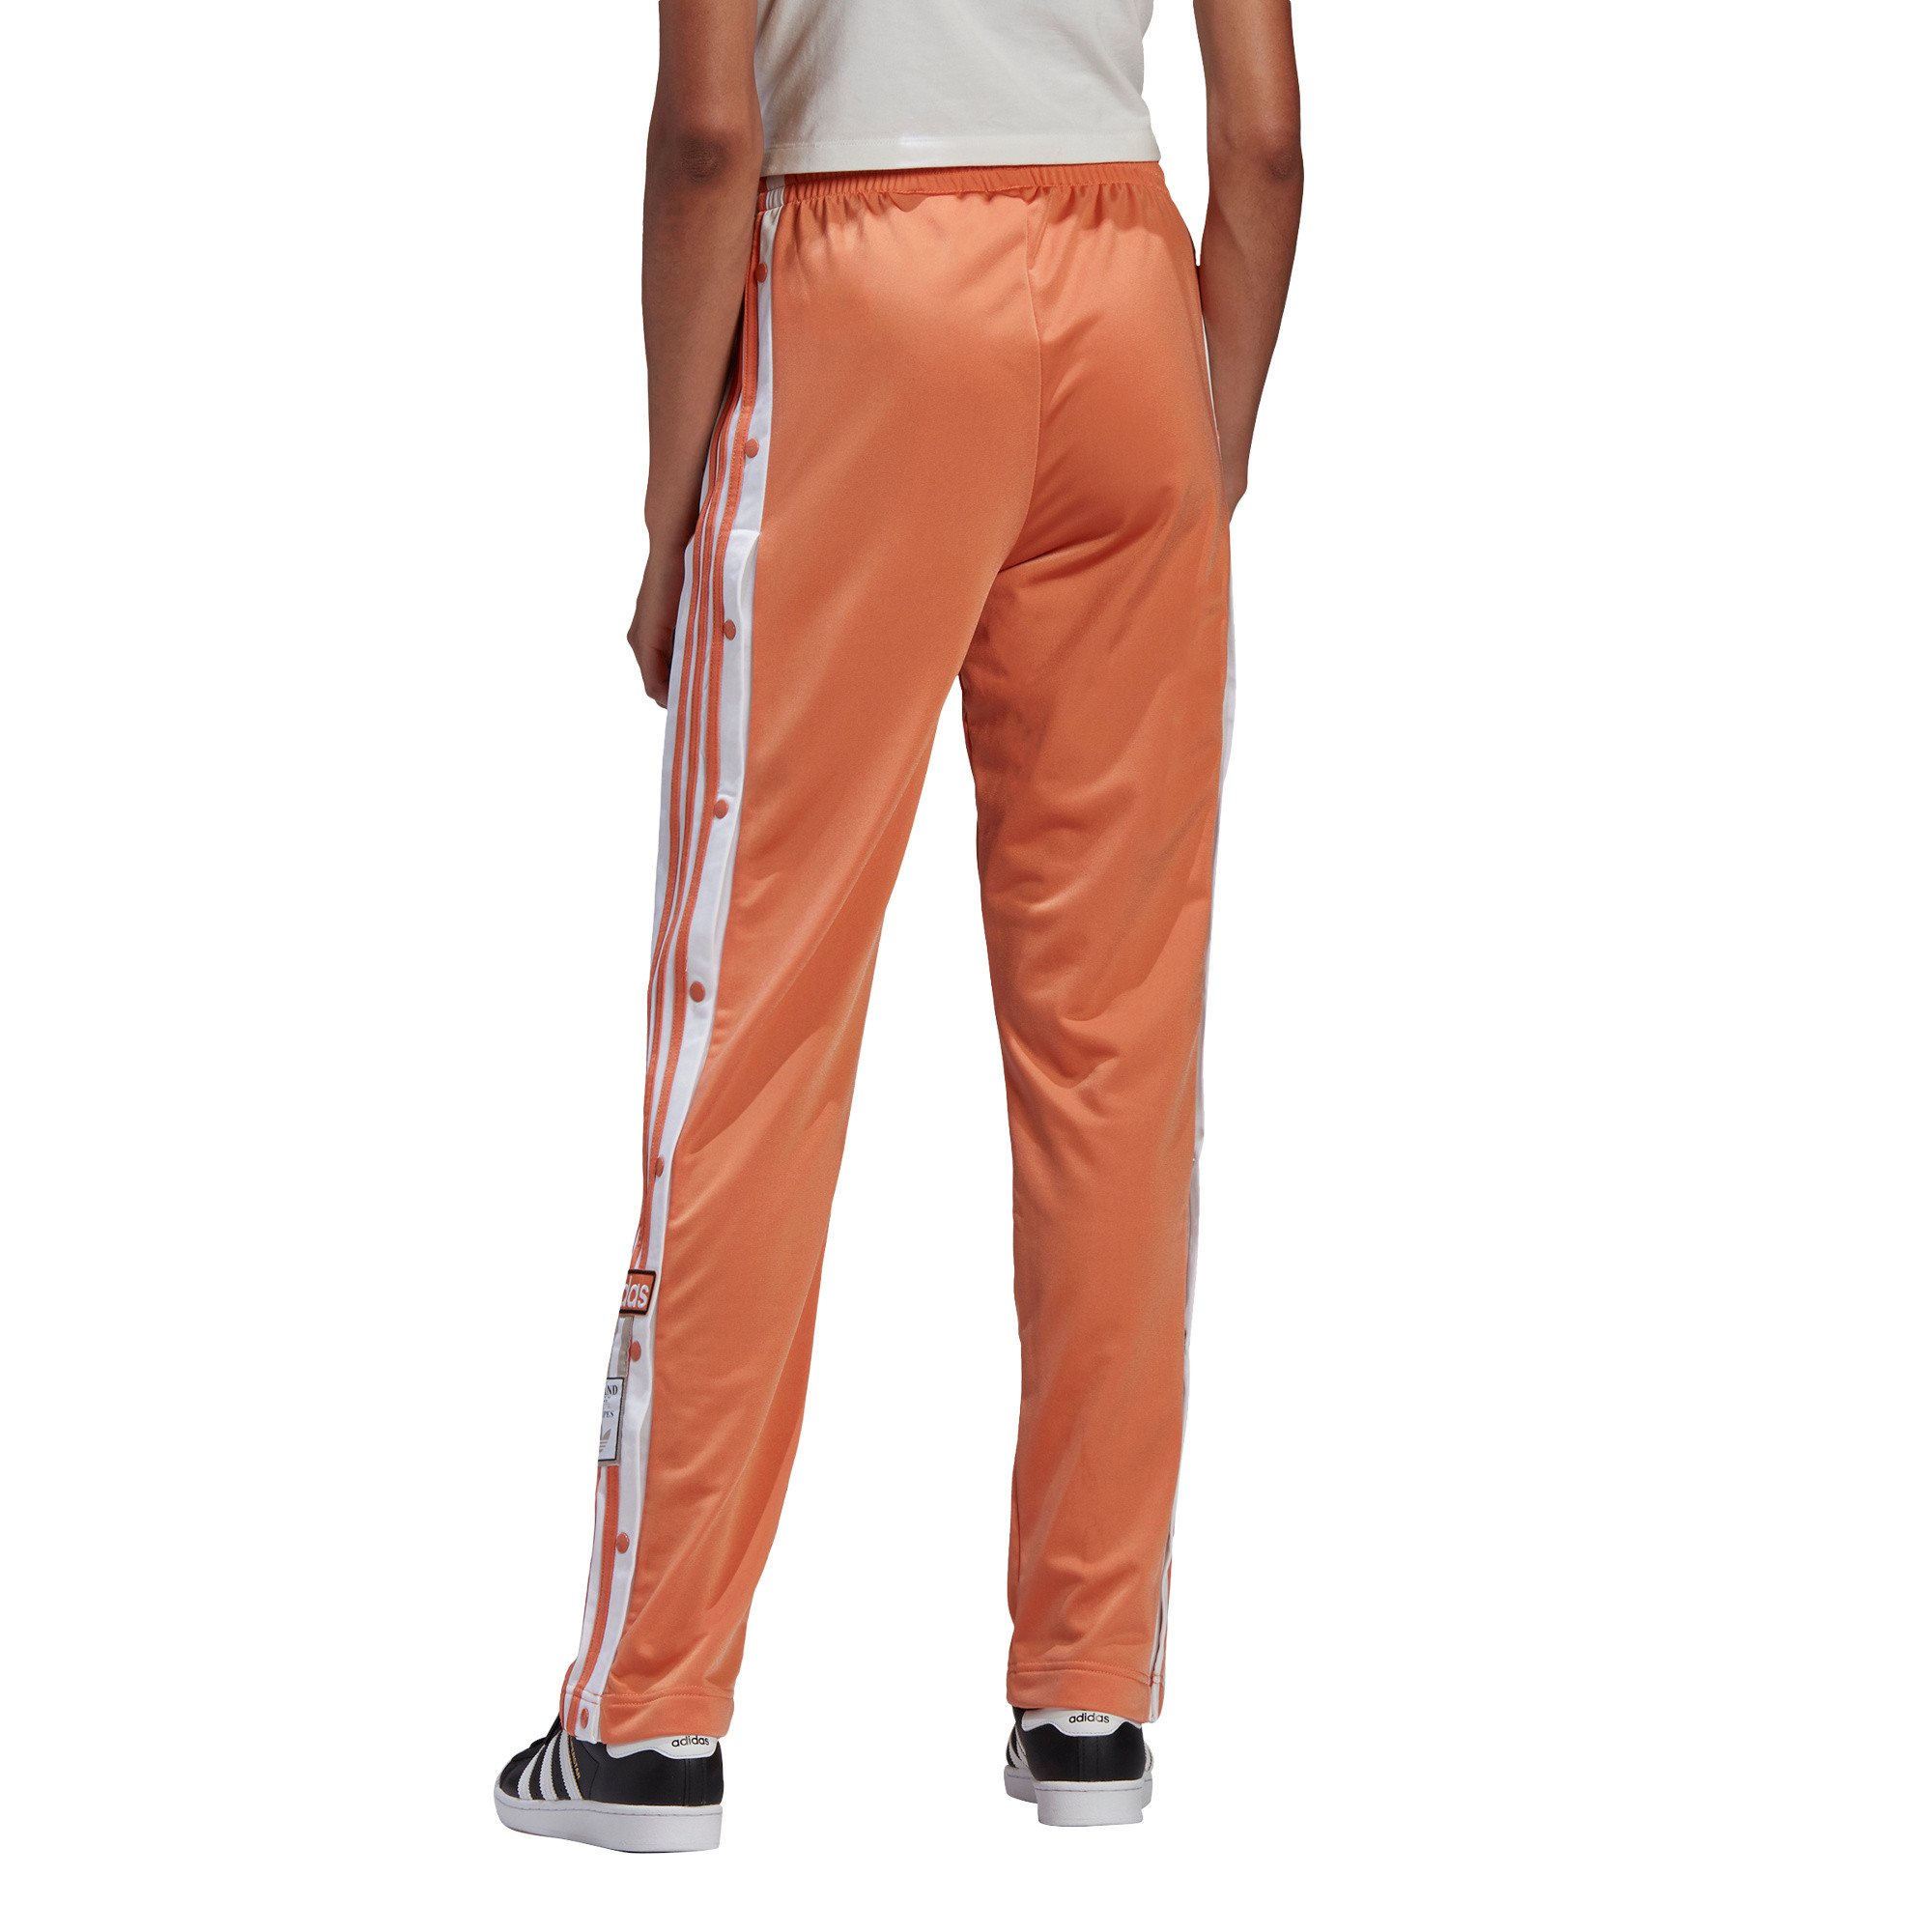 Pantaloni tuta adicolor Classics adibreak, Marrone bronzo, large image number 2